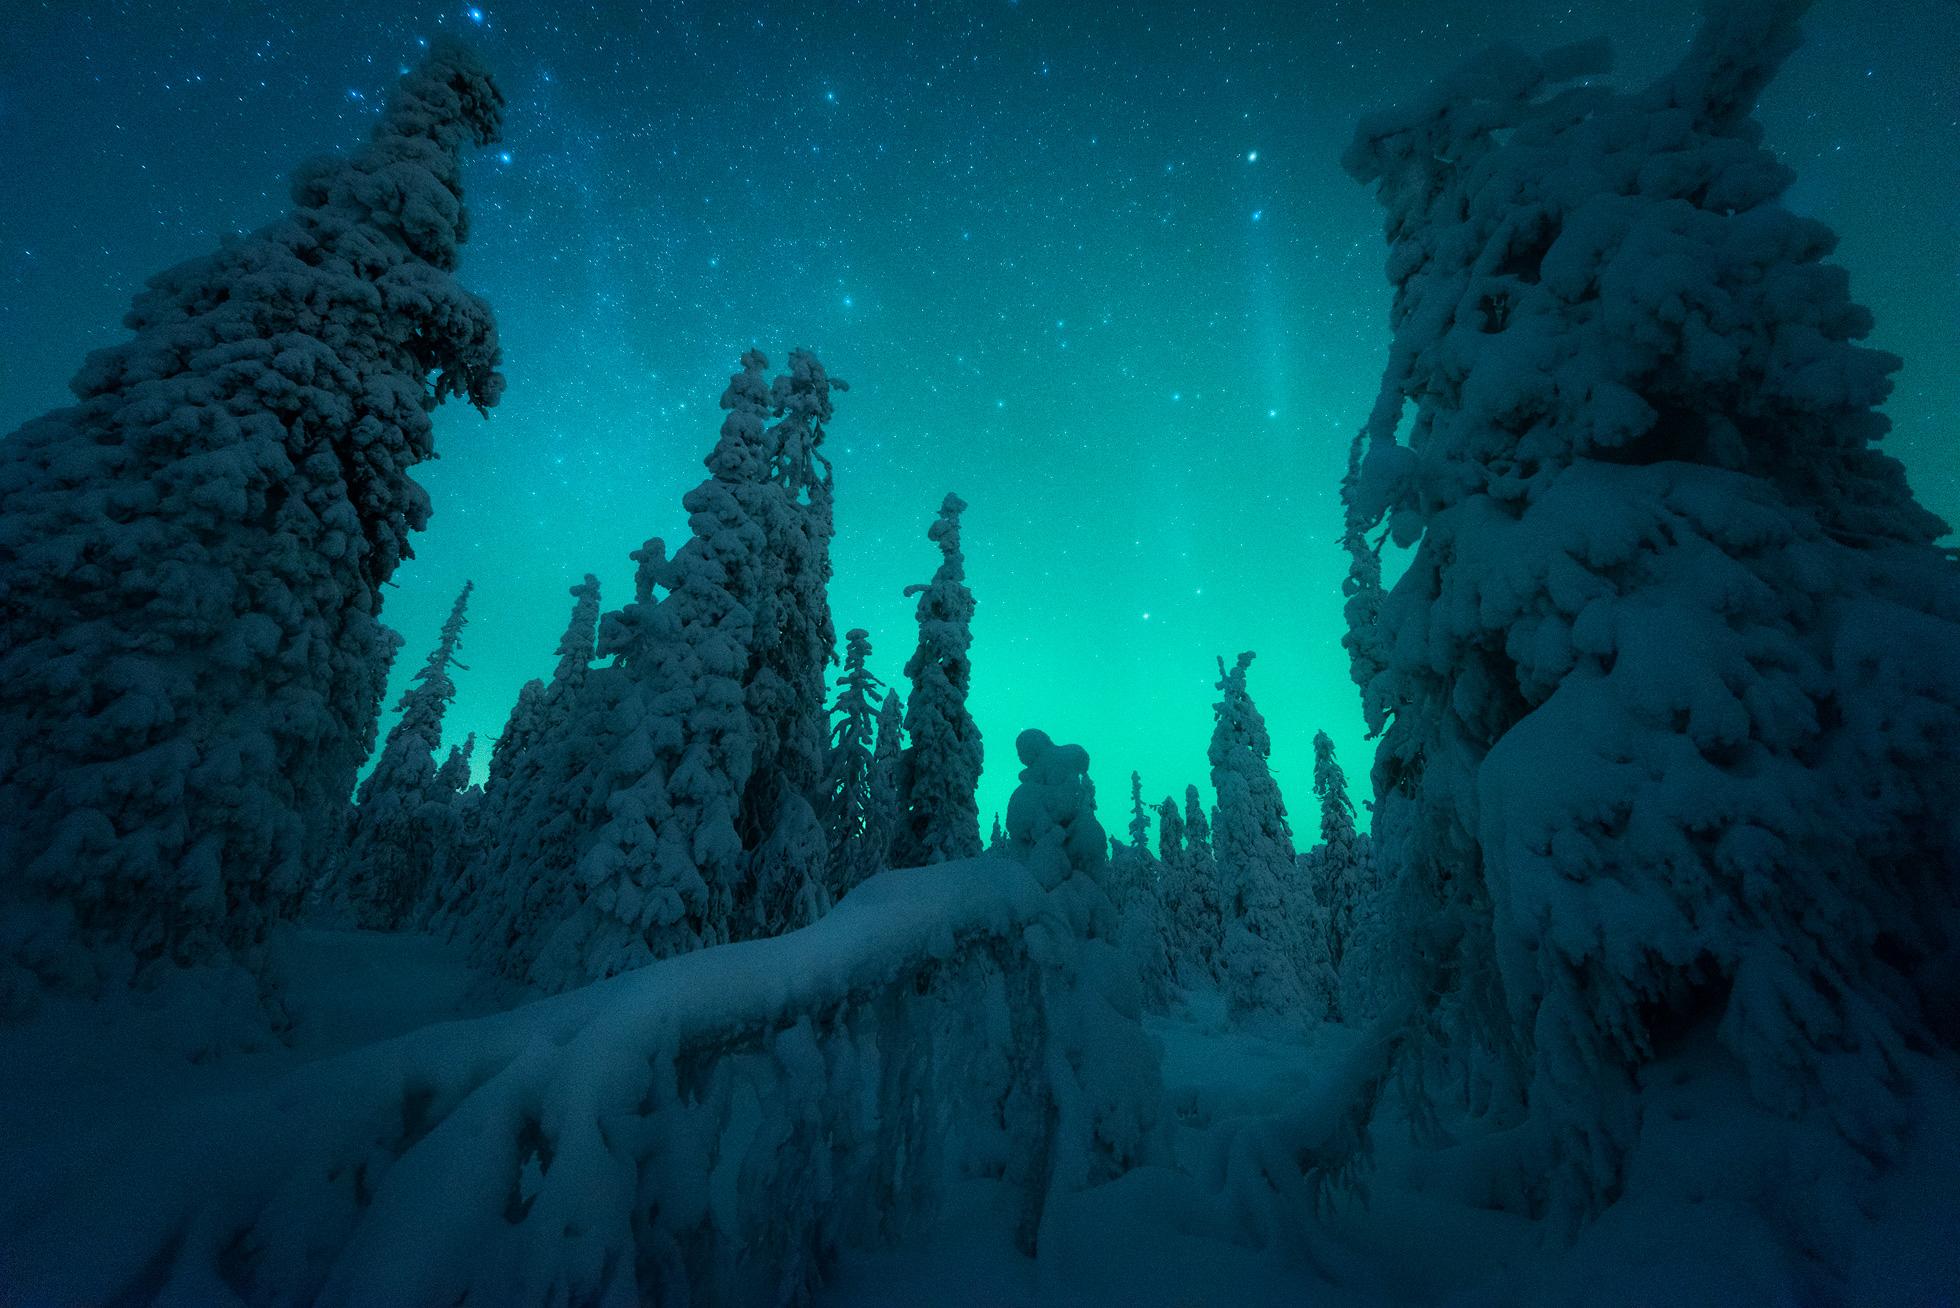 Snow covered trees under an aurora sky